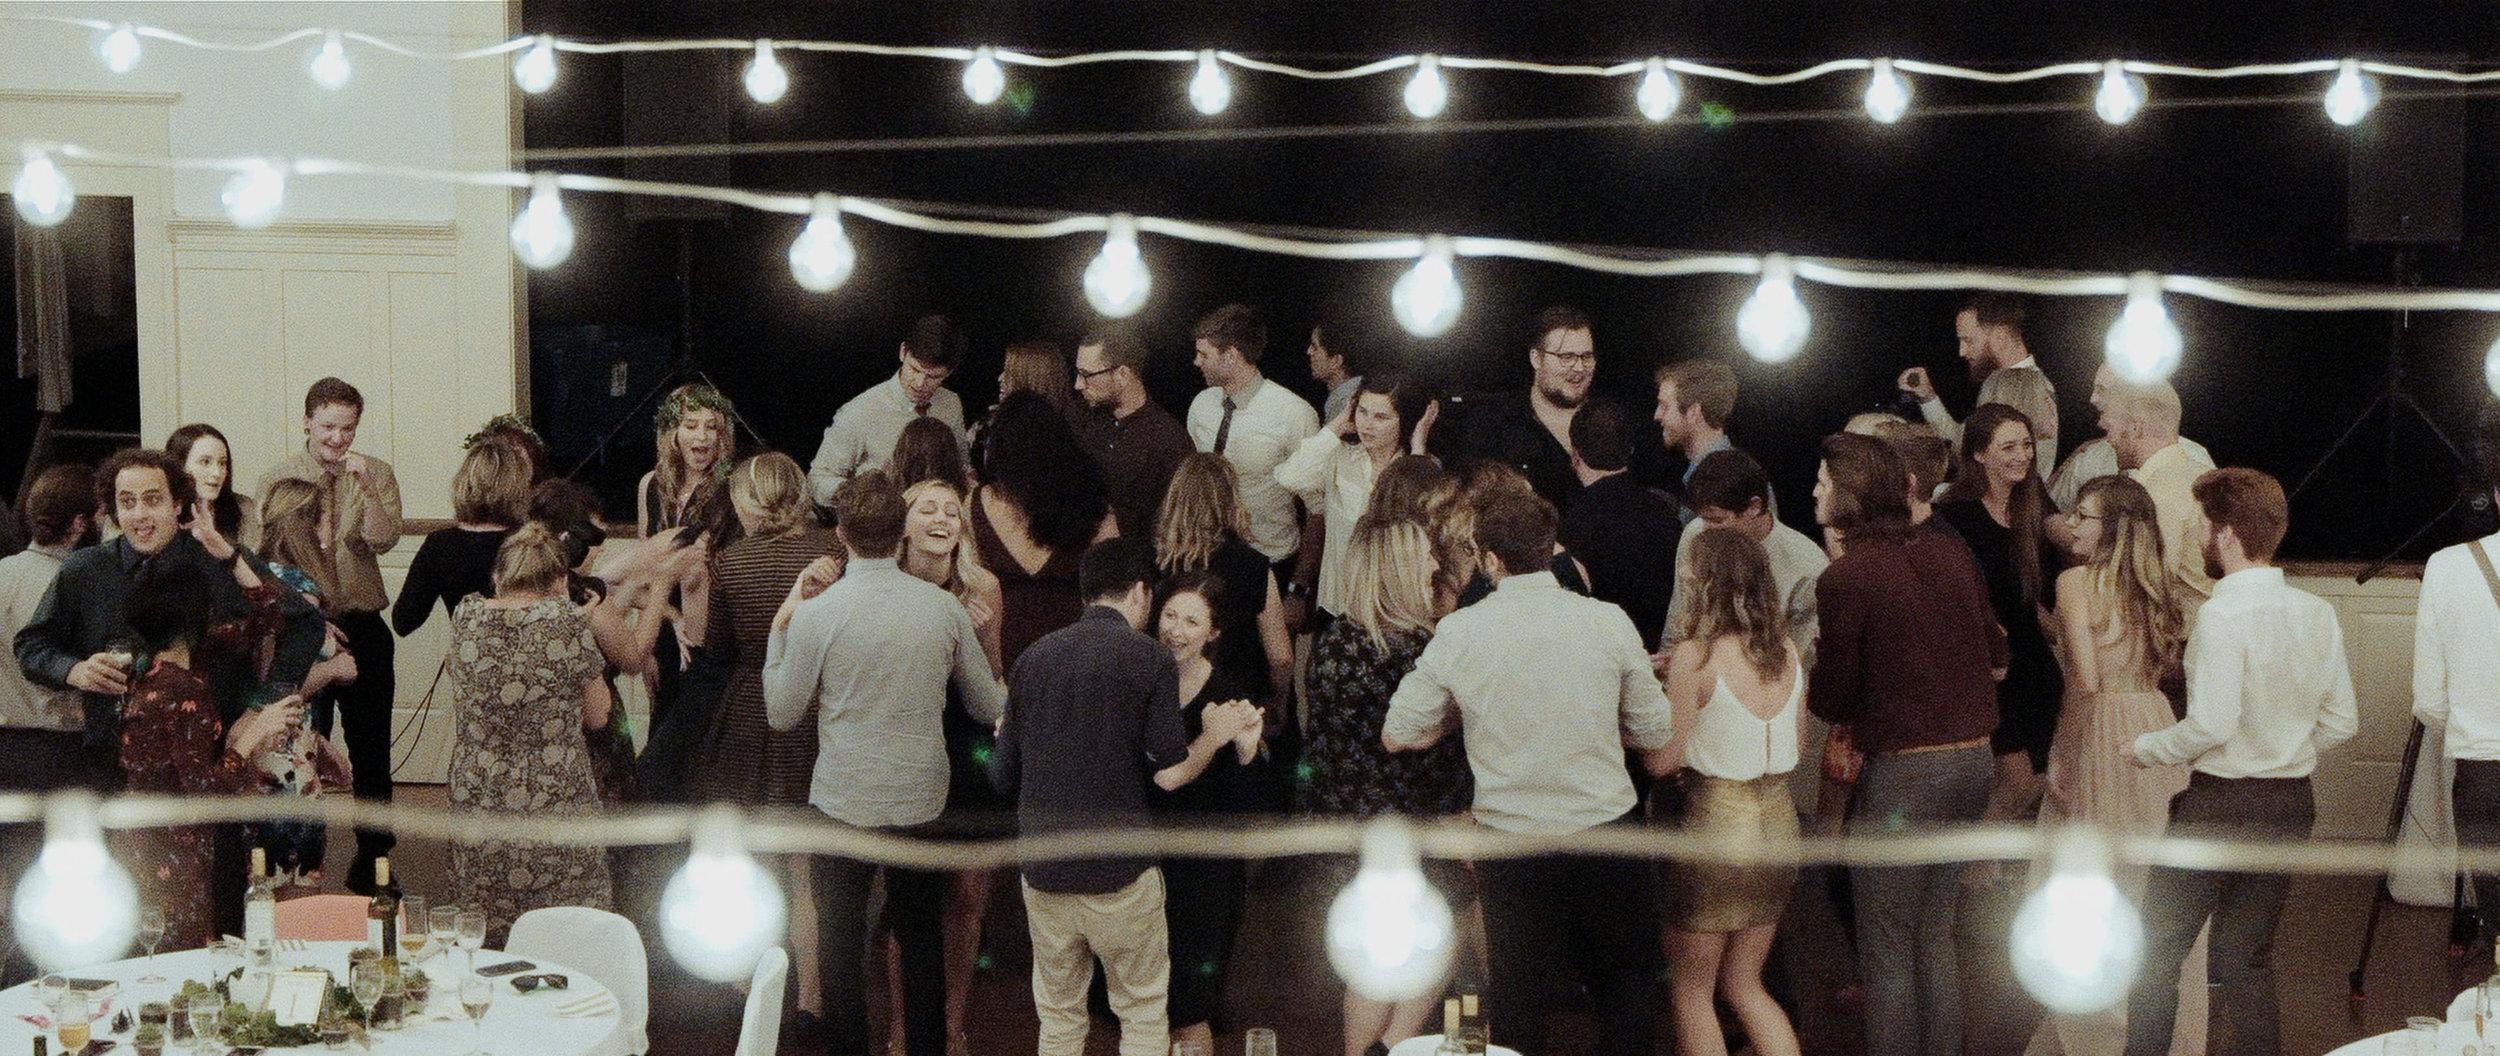 vancouver-wedding-videography188.jpg